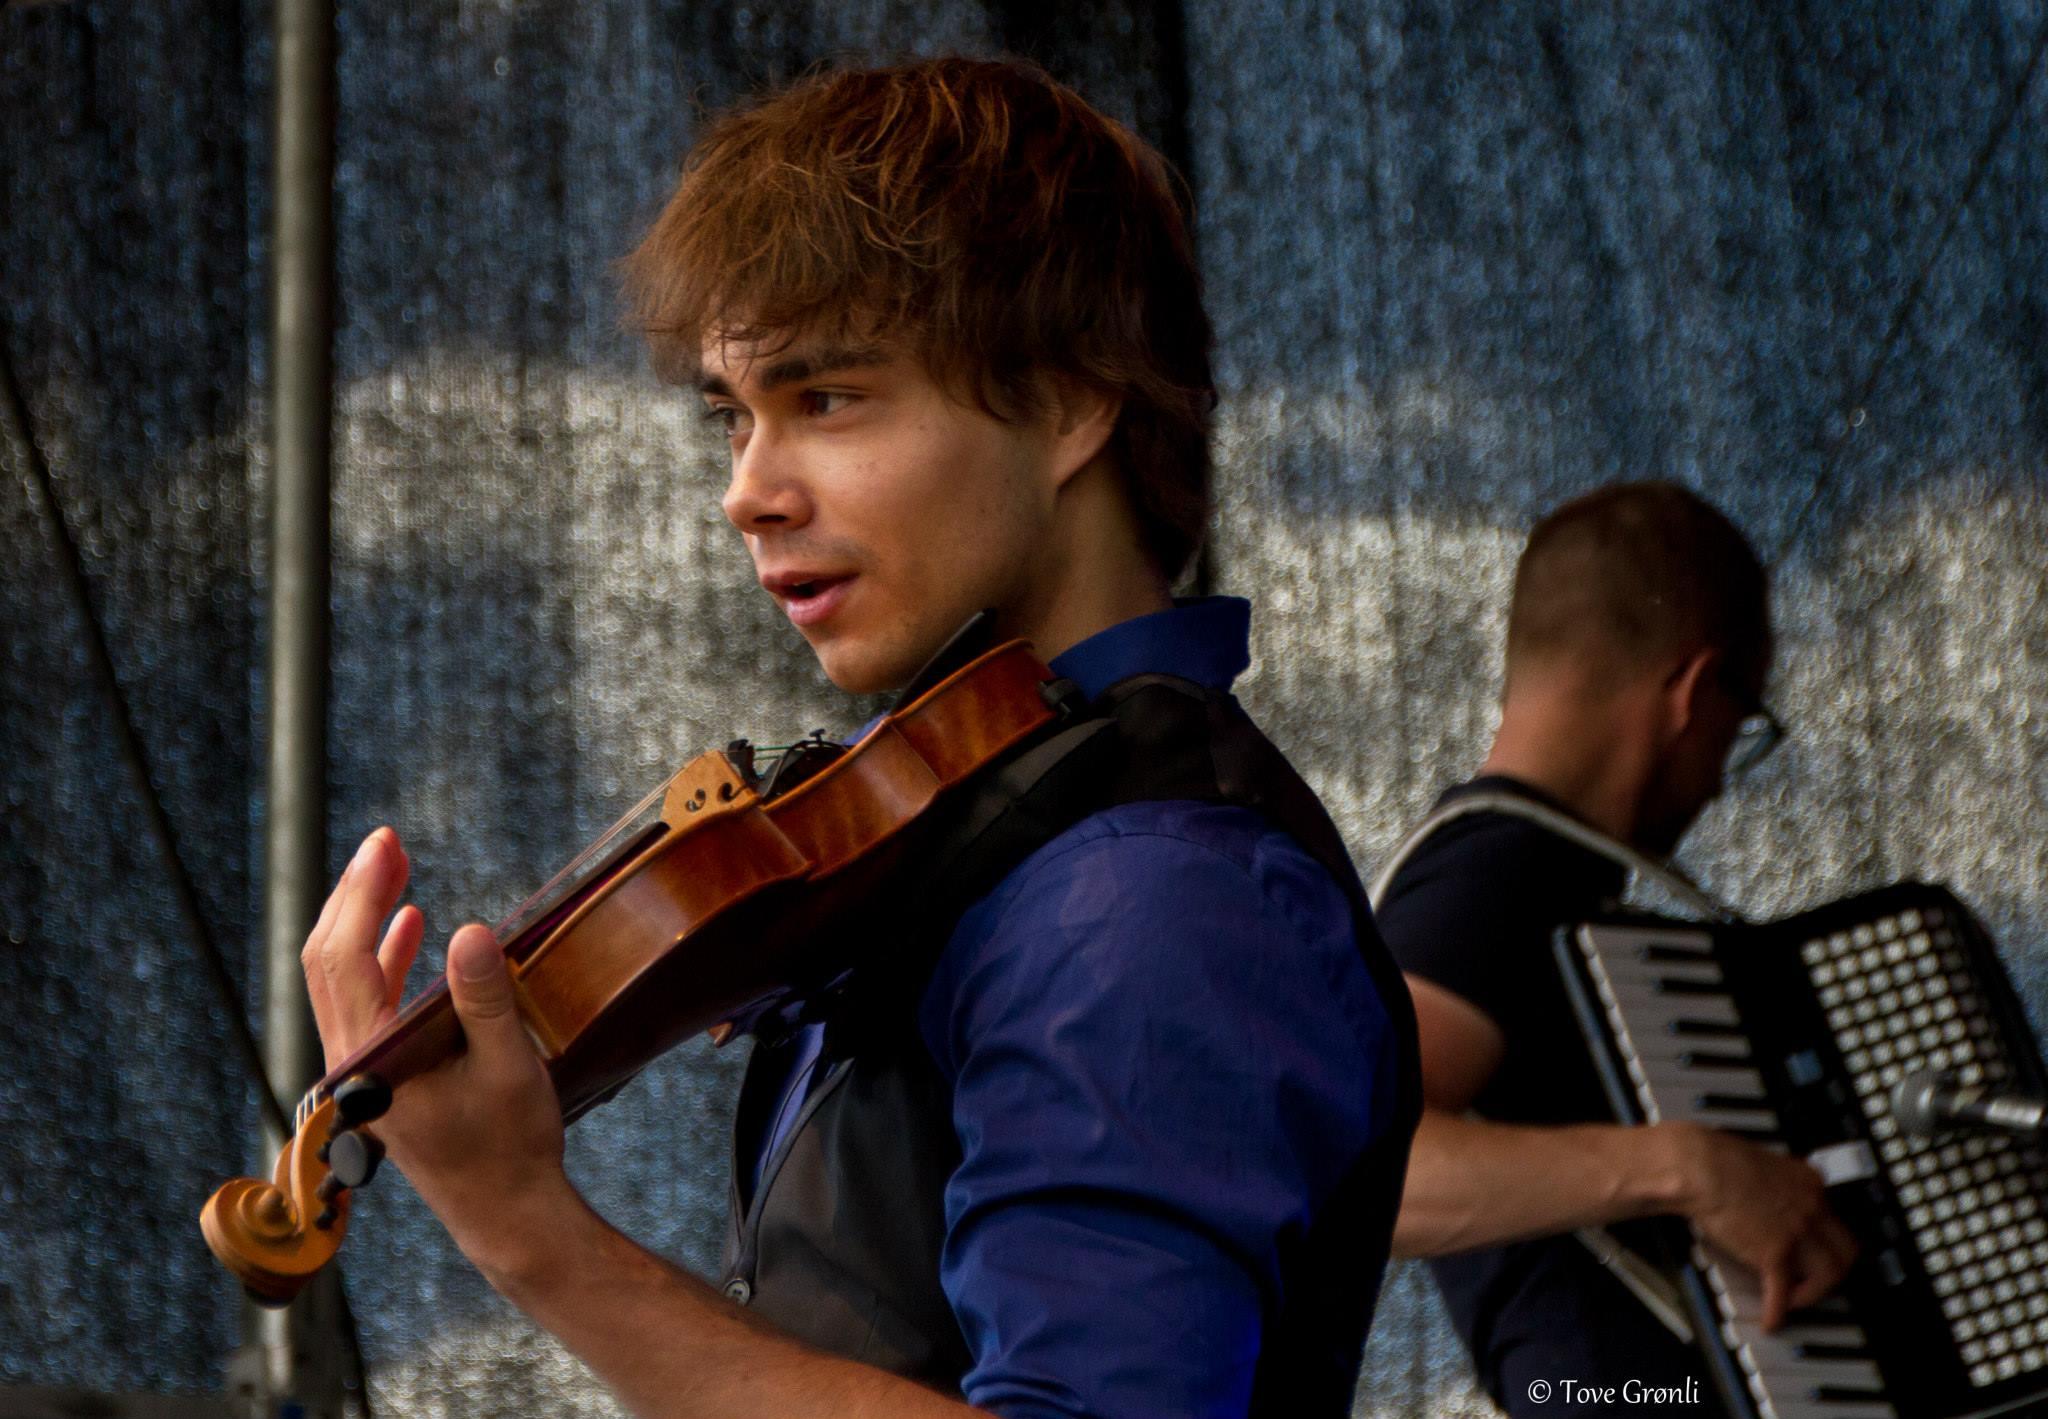 Alexander on a Musical Journey.